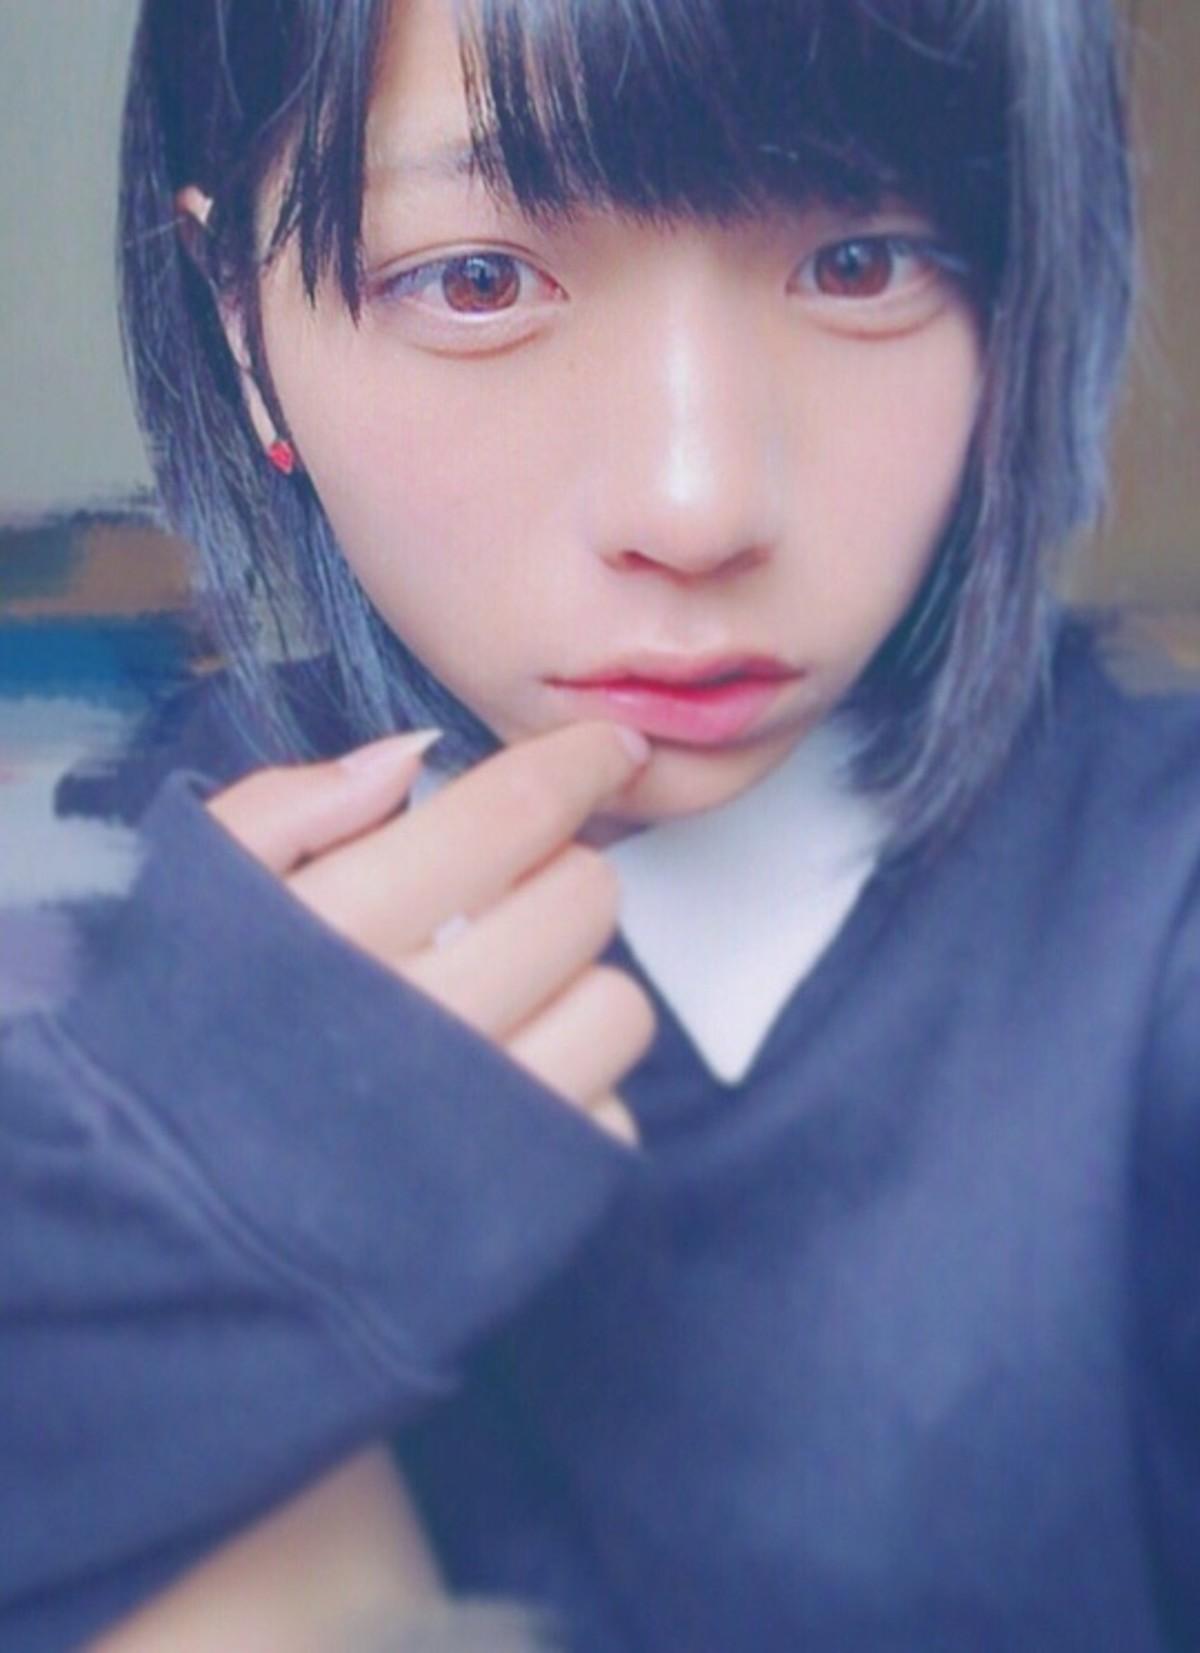 cute girl or cute boy